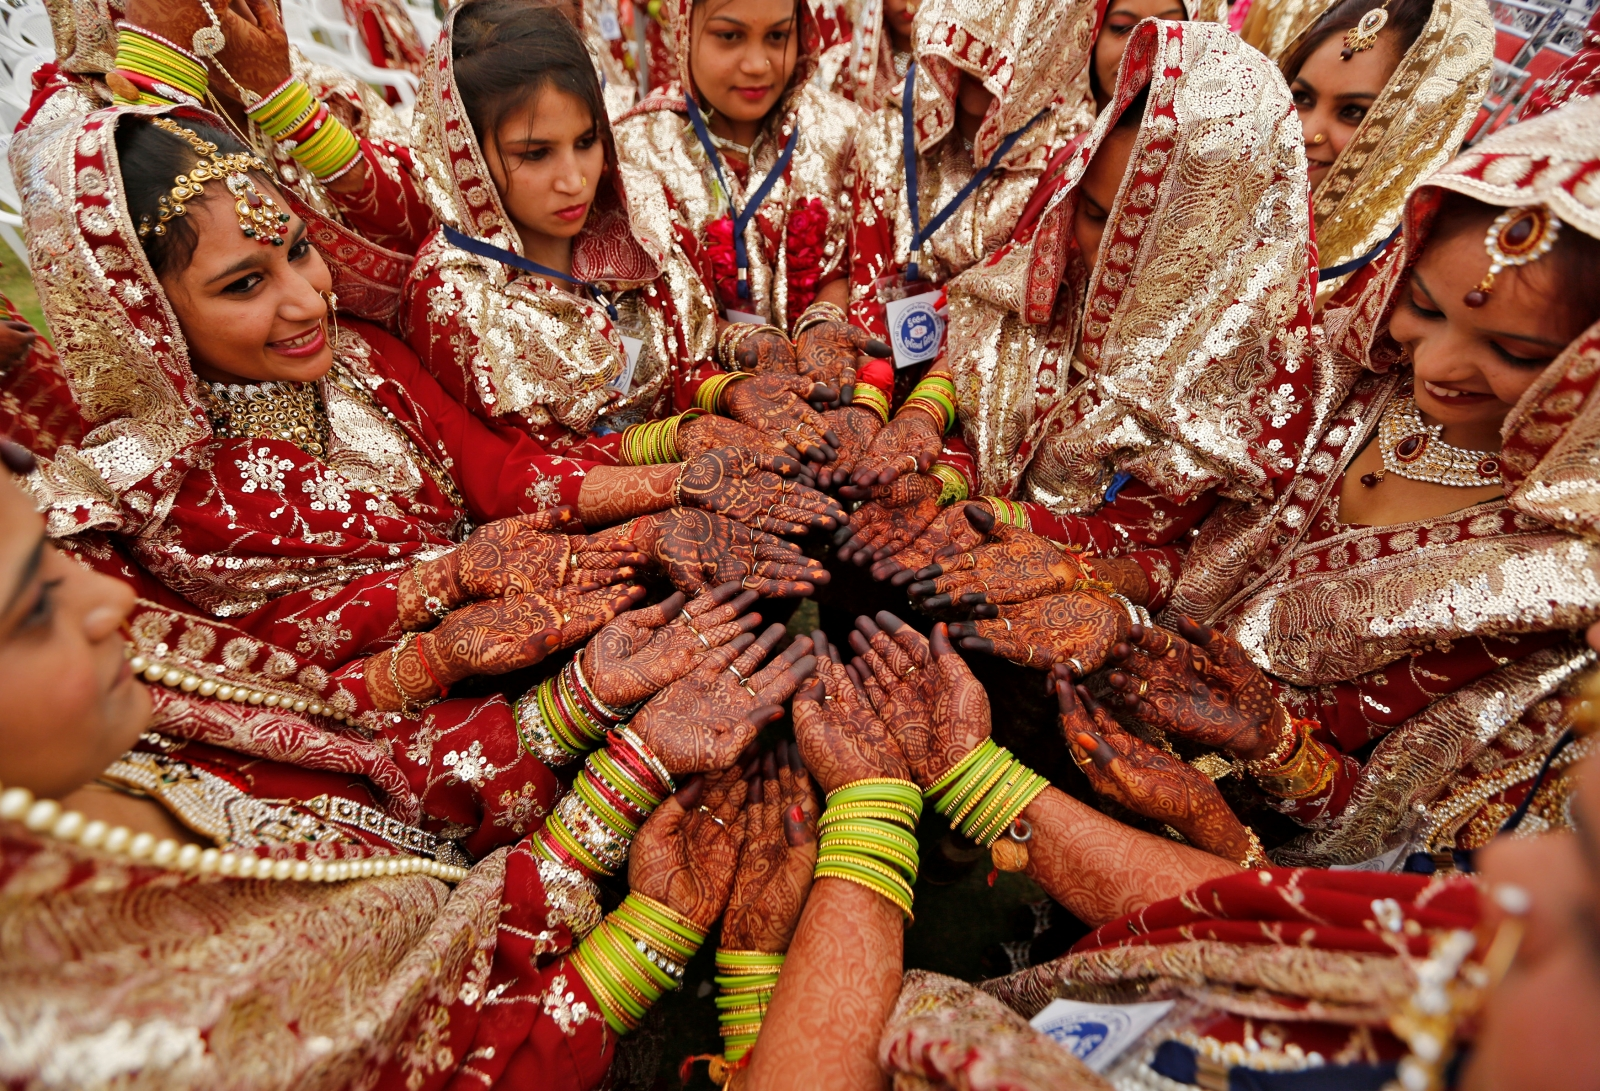 MP Minister Gopal Bhargava gifts brides wooden bats for reforming drunkard husbands